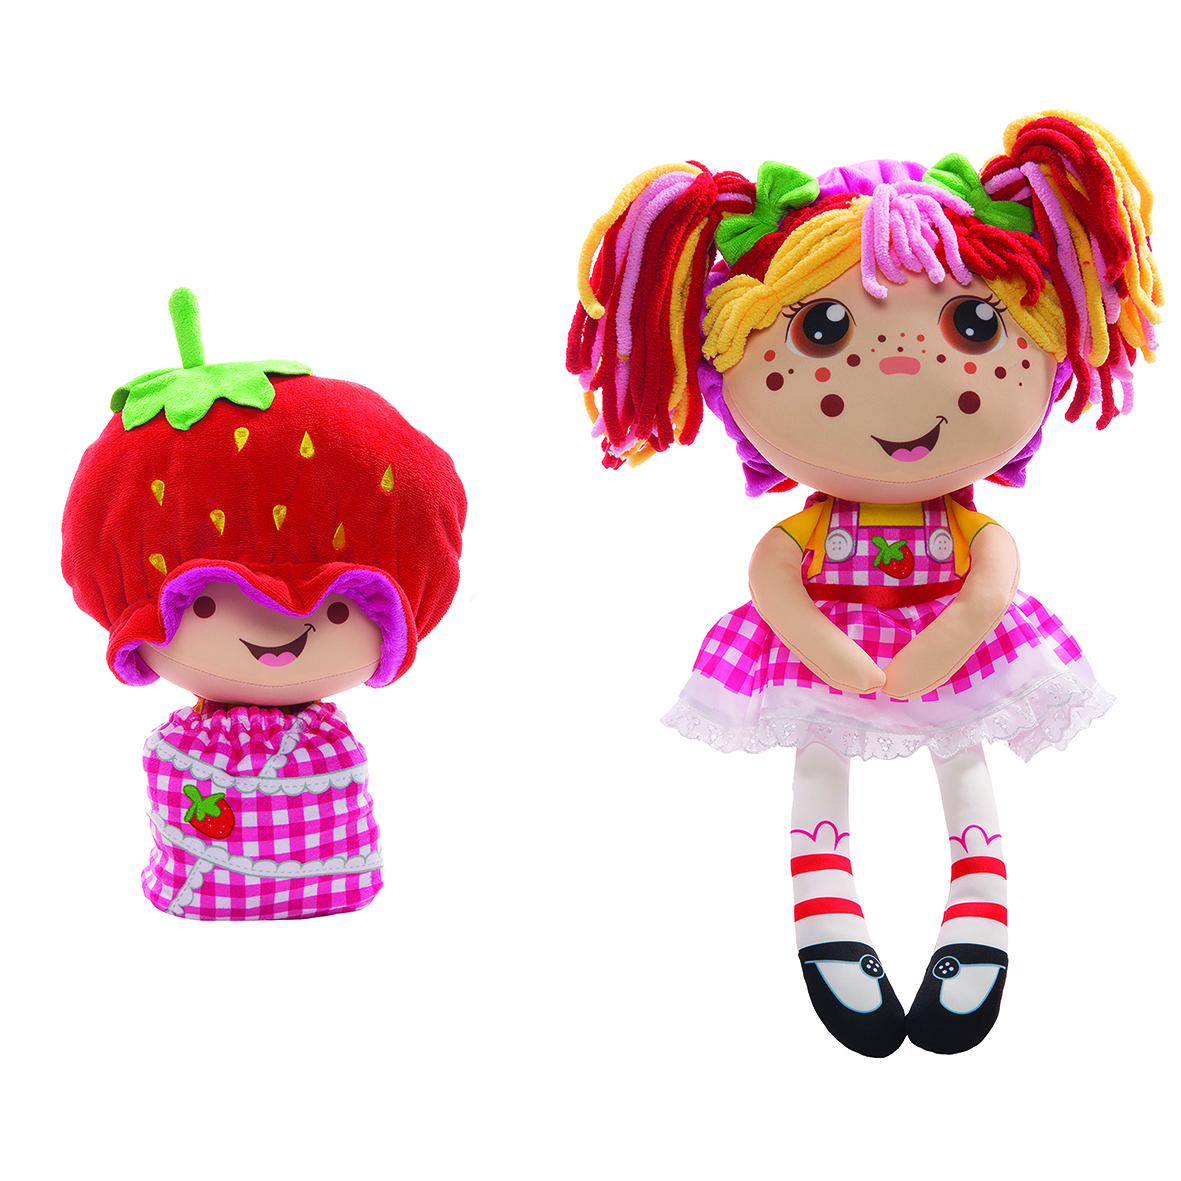 Мягкие игрушки 1toy Девчушка-вывернушка Ксюшка мягкая игрушка девчушка вывернушка ксюшка 2в1 23 38 см